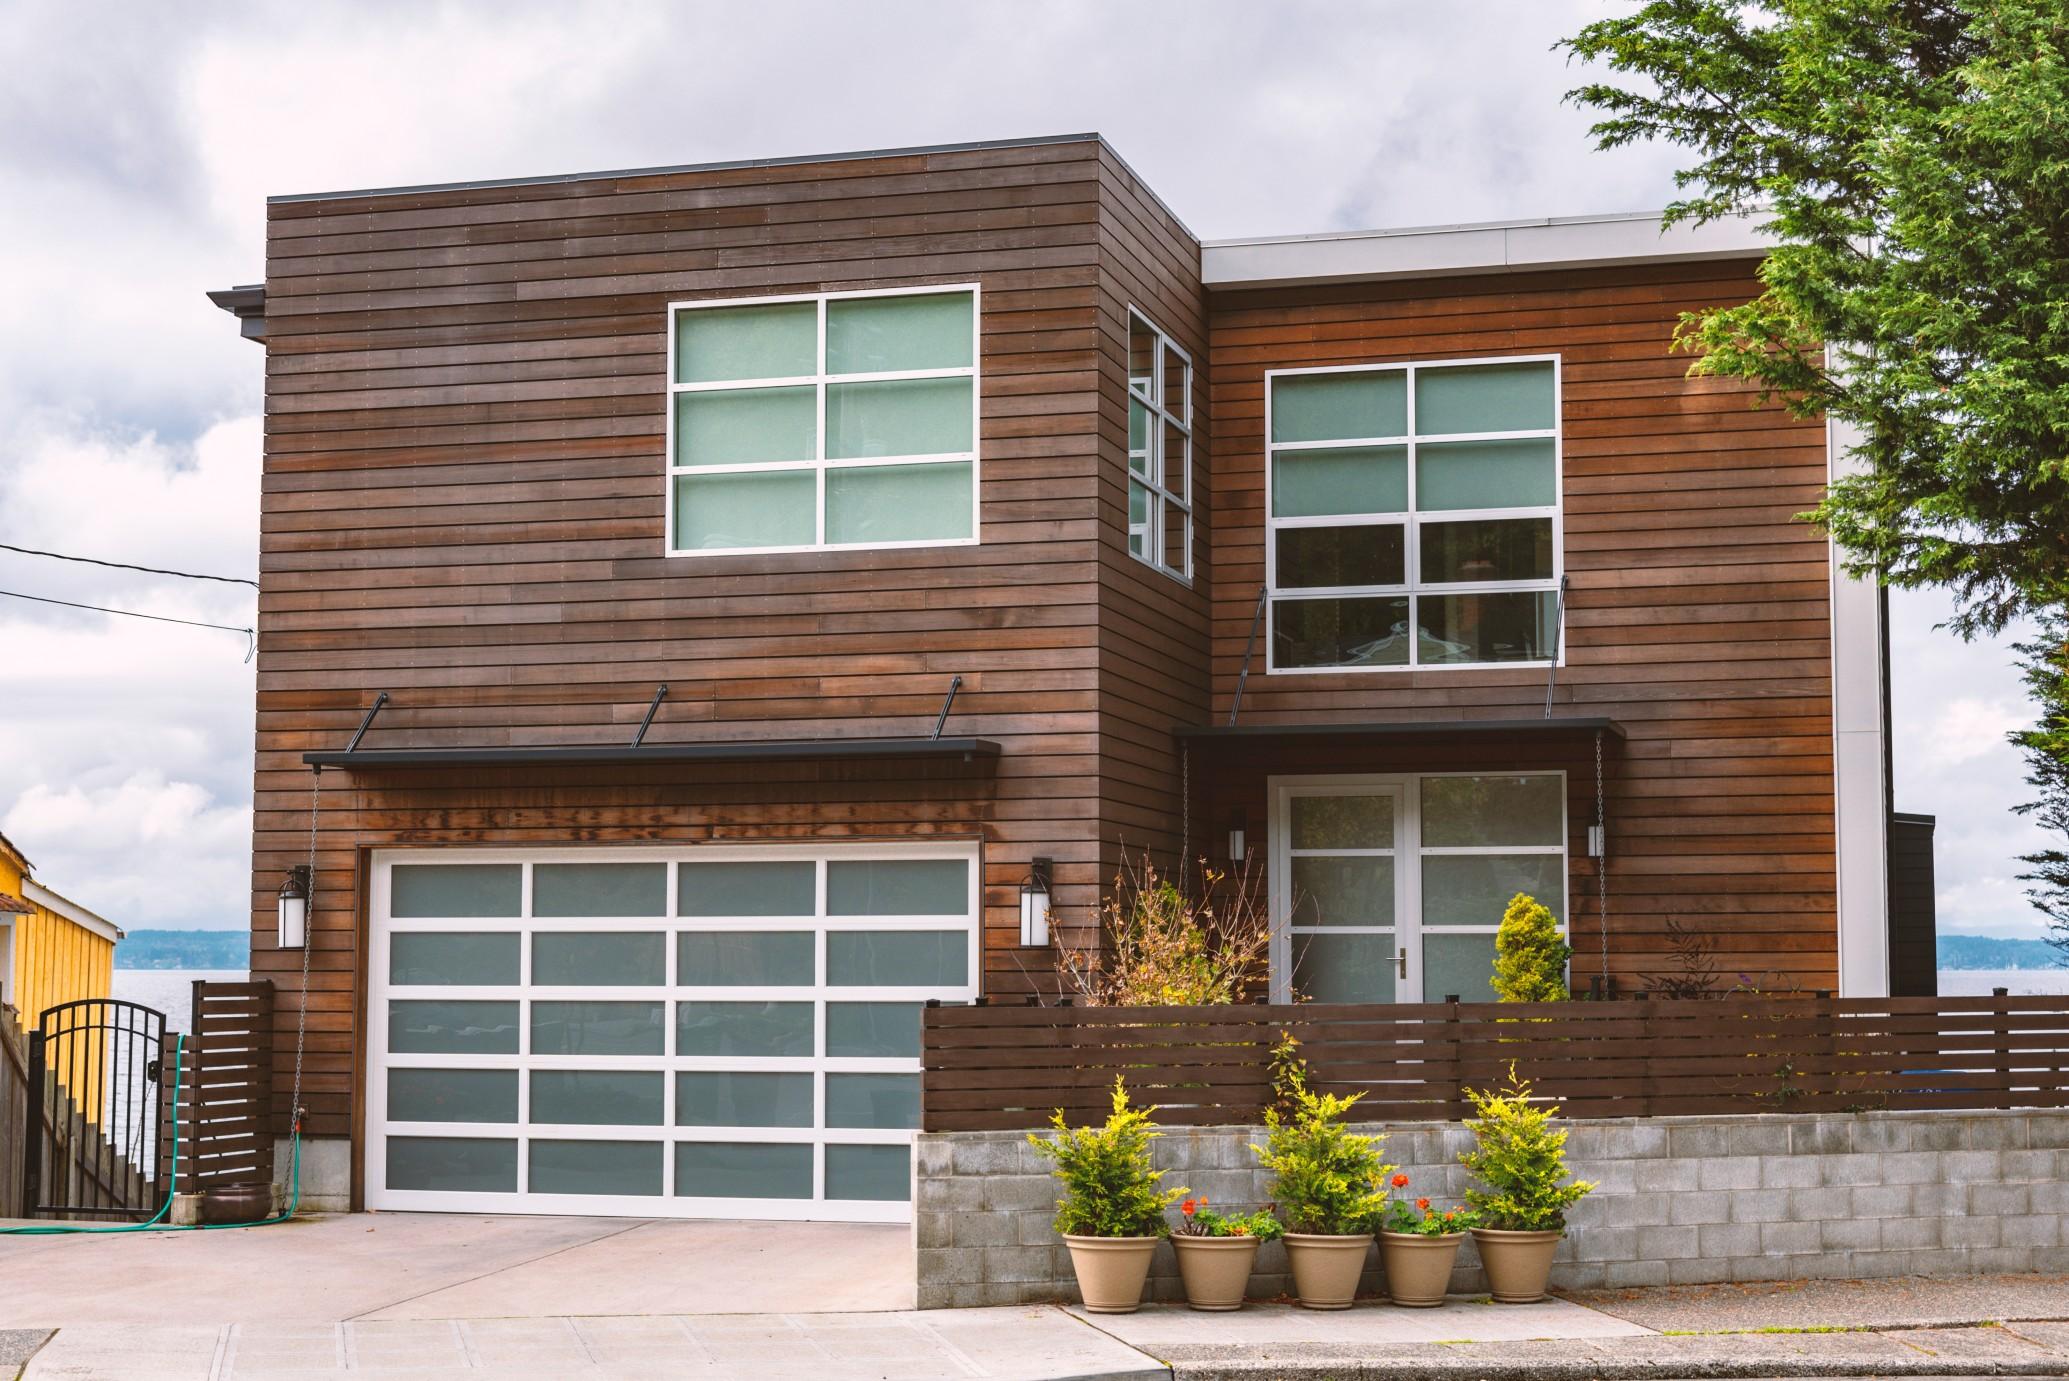 Haus im Bauhausstil mit Flachdach. Foto RLTheis via Twenty20